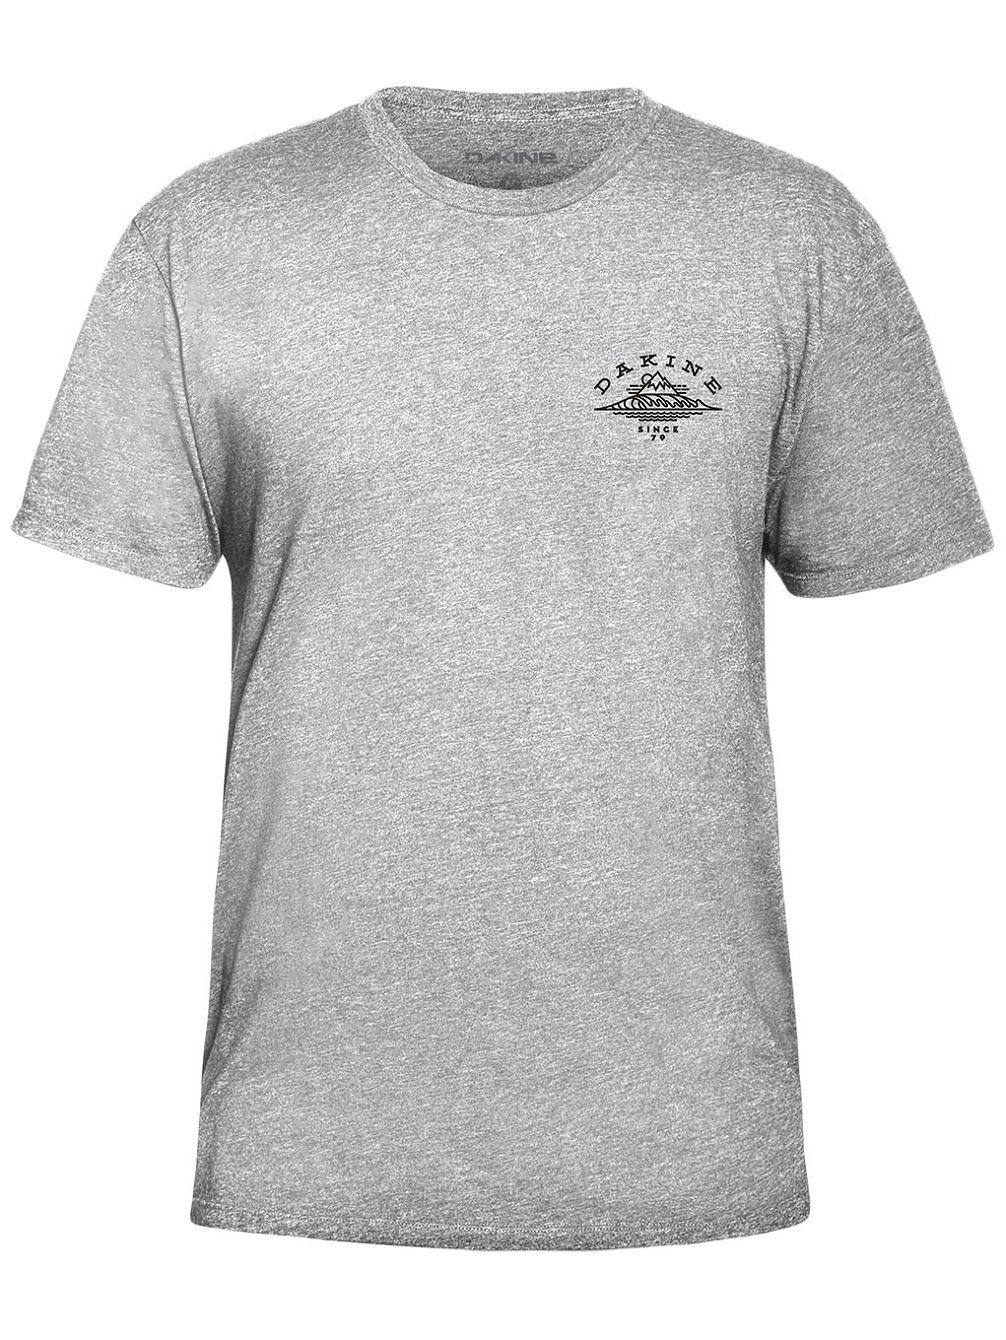 makers-t-shirt